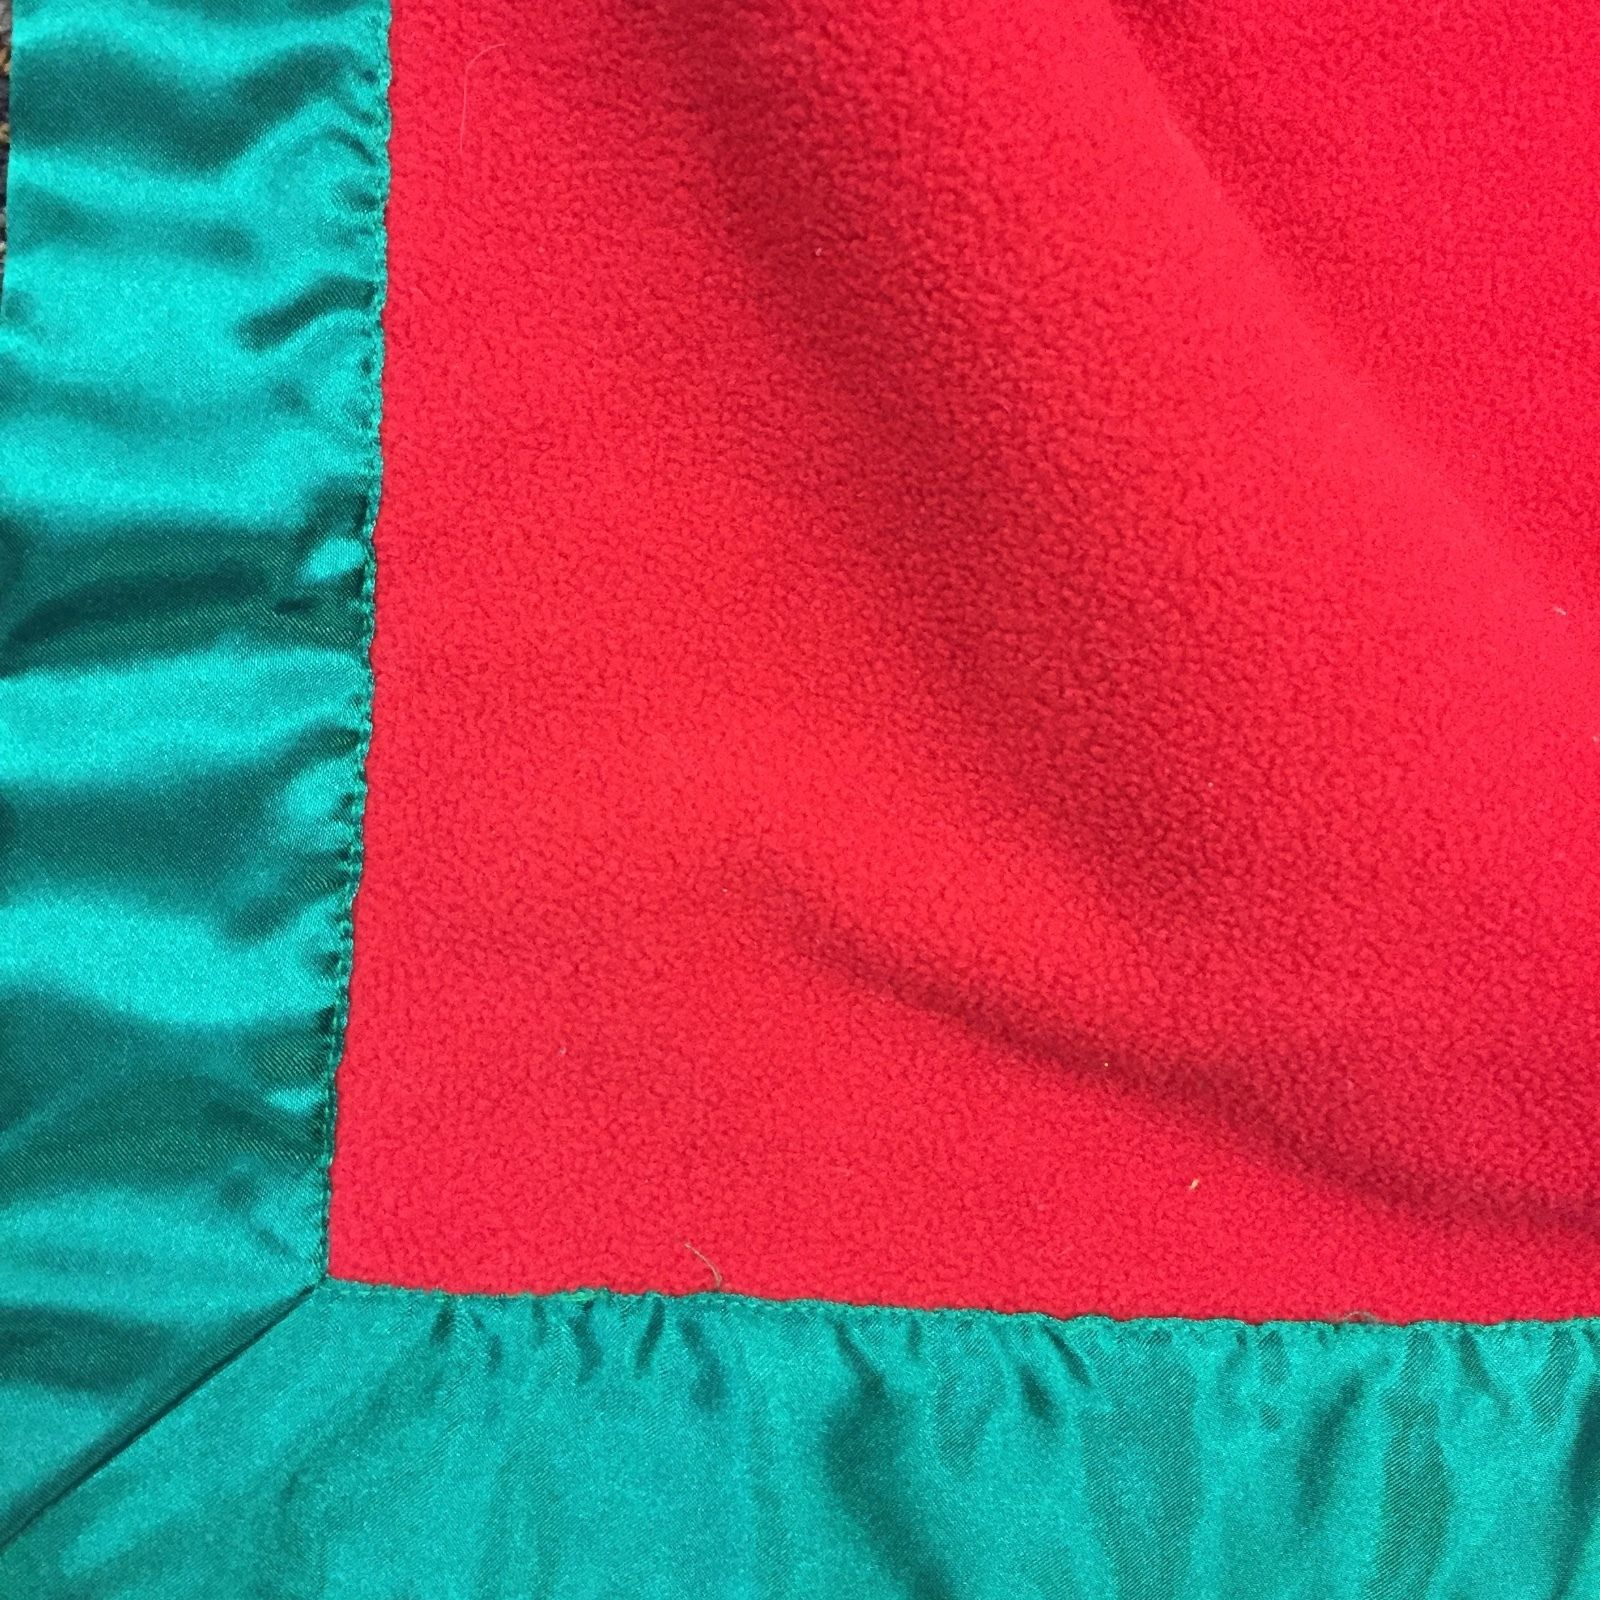 a29208bf6 Koala Baby - Christmas Santa Blanket - Red Fleece & Satin Trim Security  Lovey